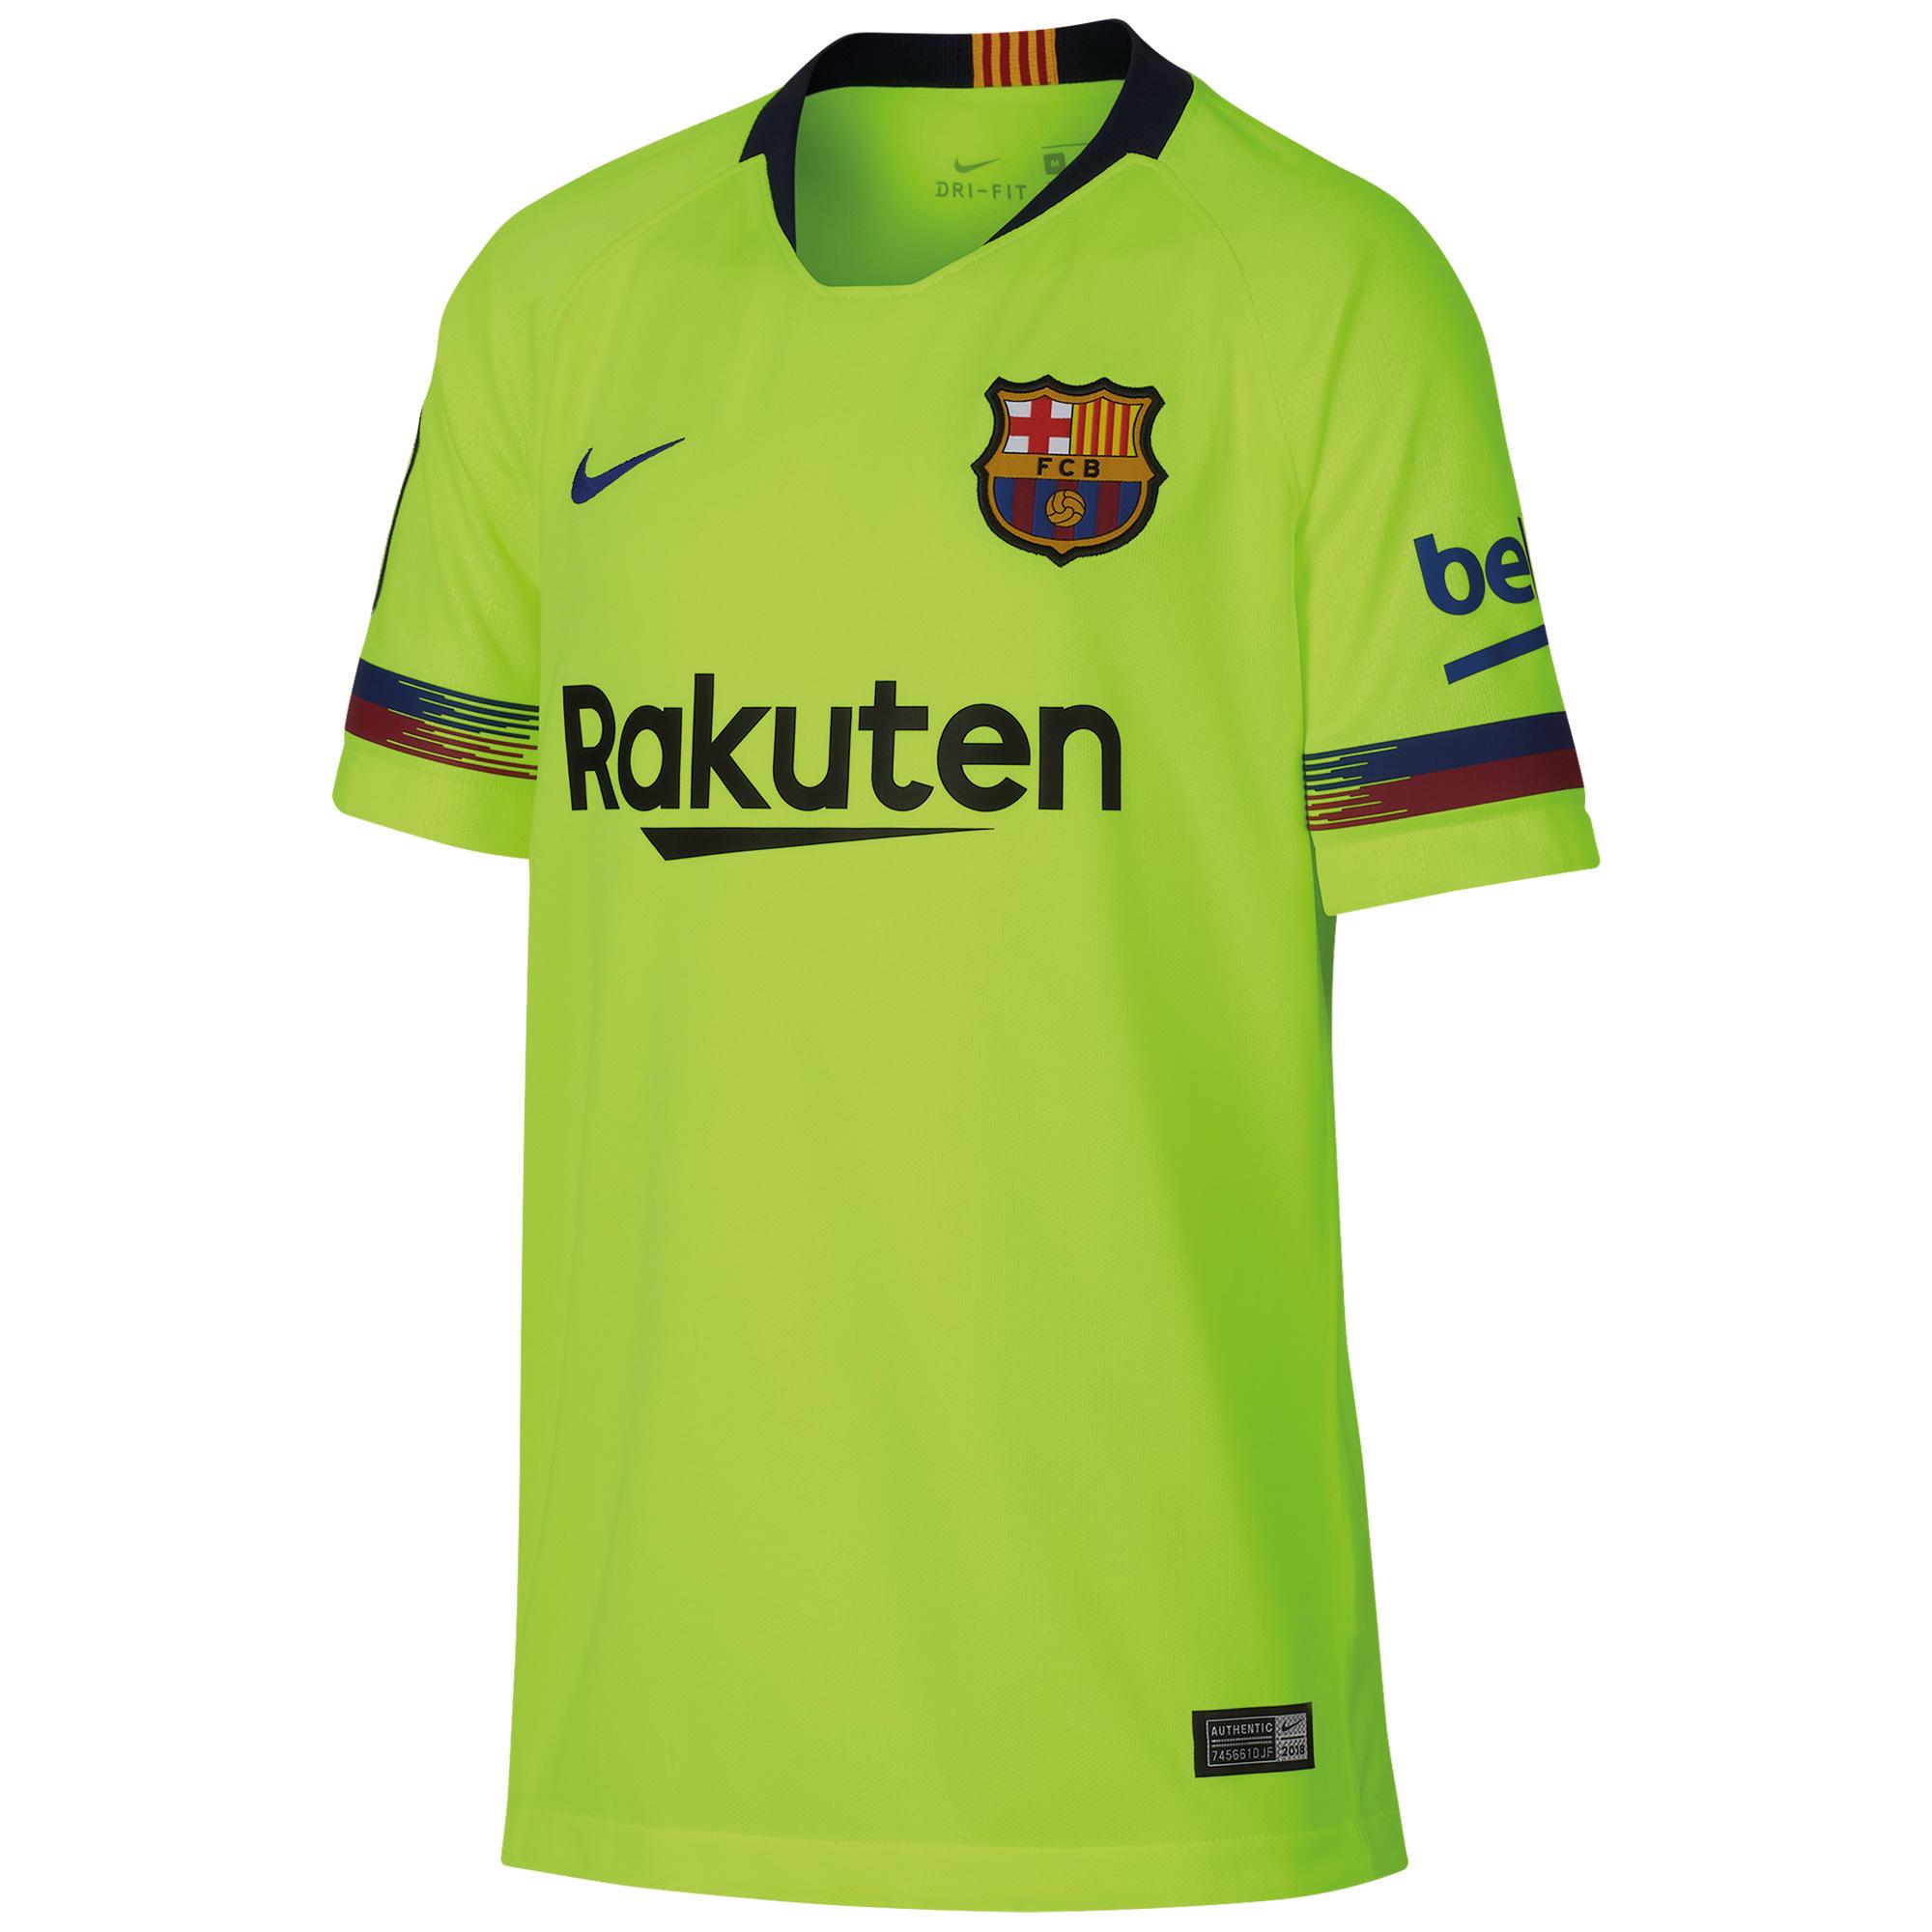 3f0ea3f4cab Barcelona fanshop kopen? | Decathlon.nl